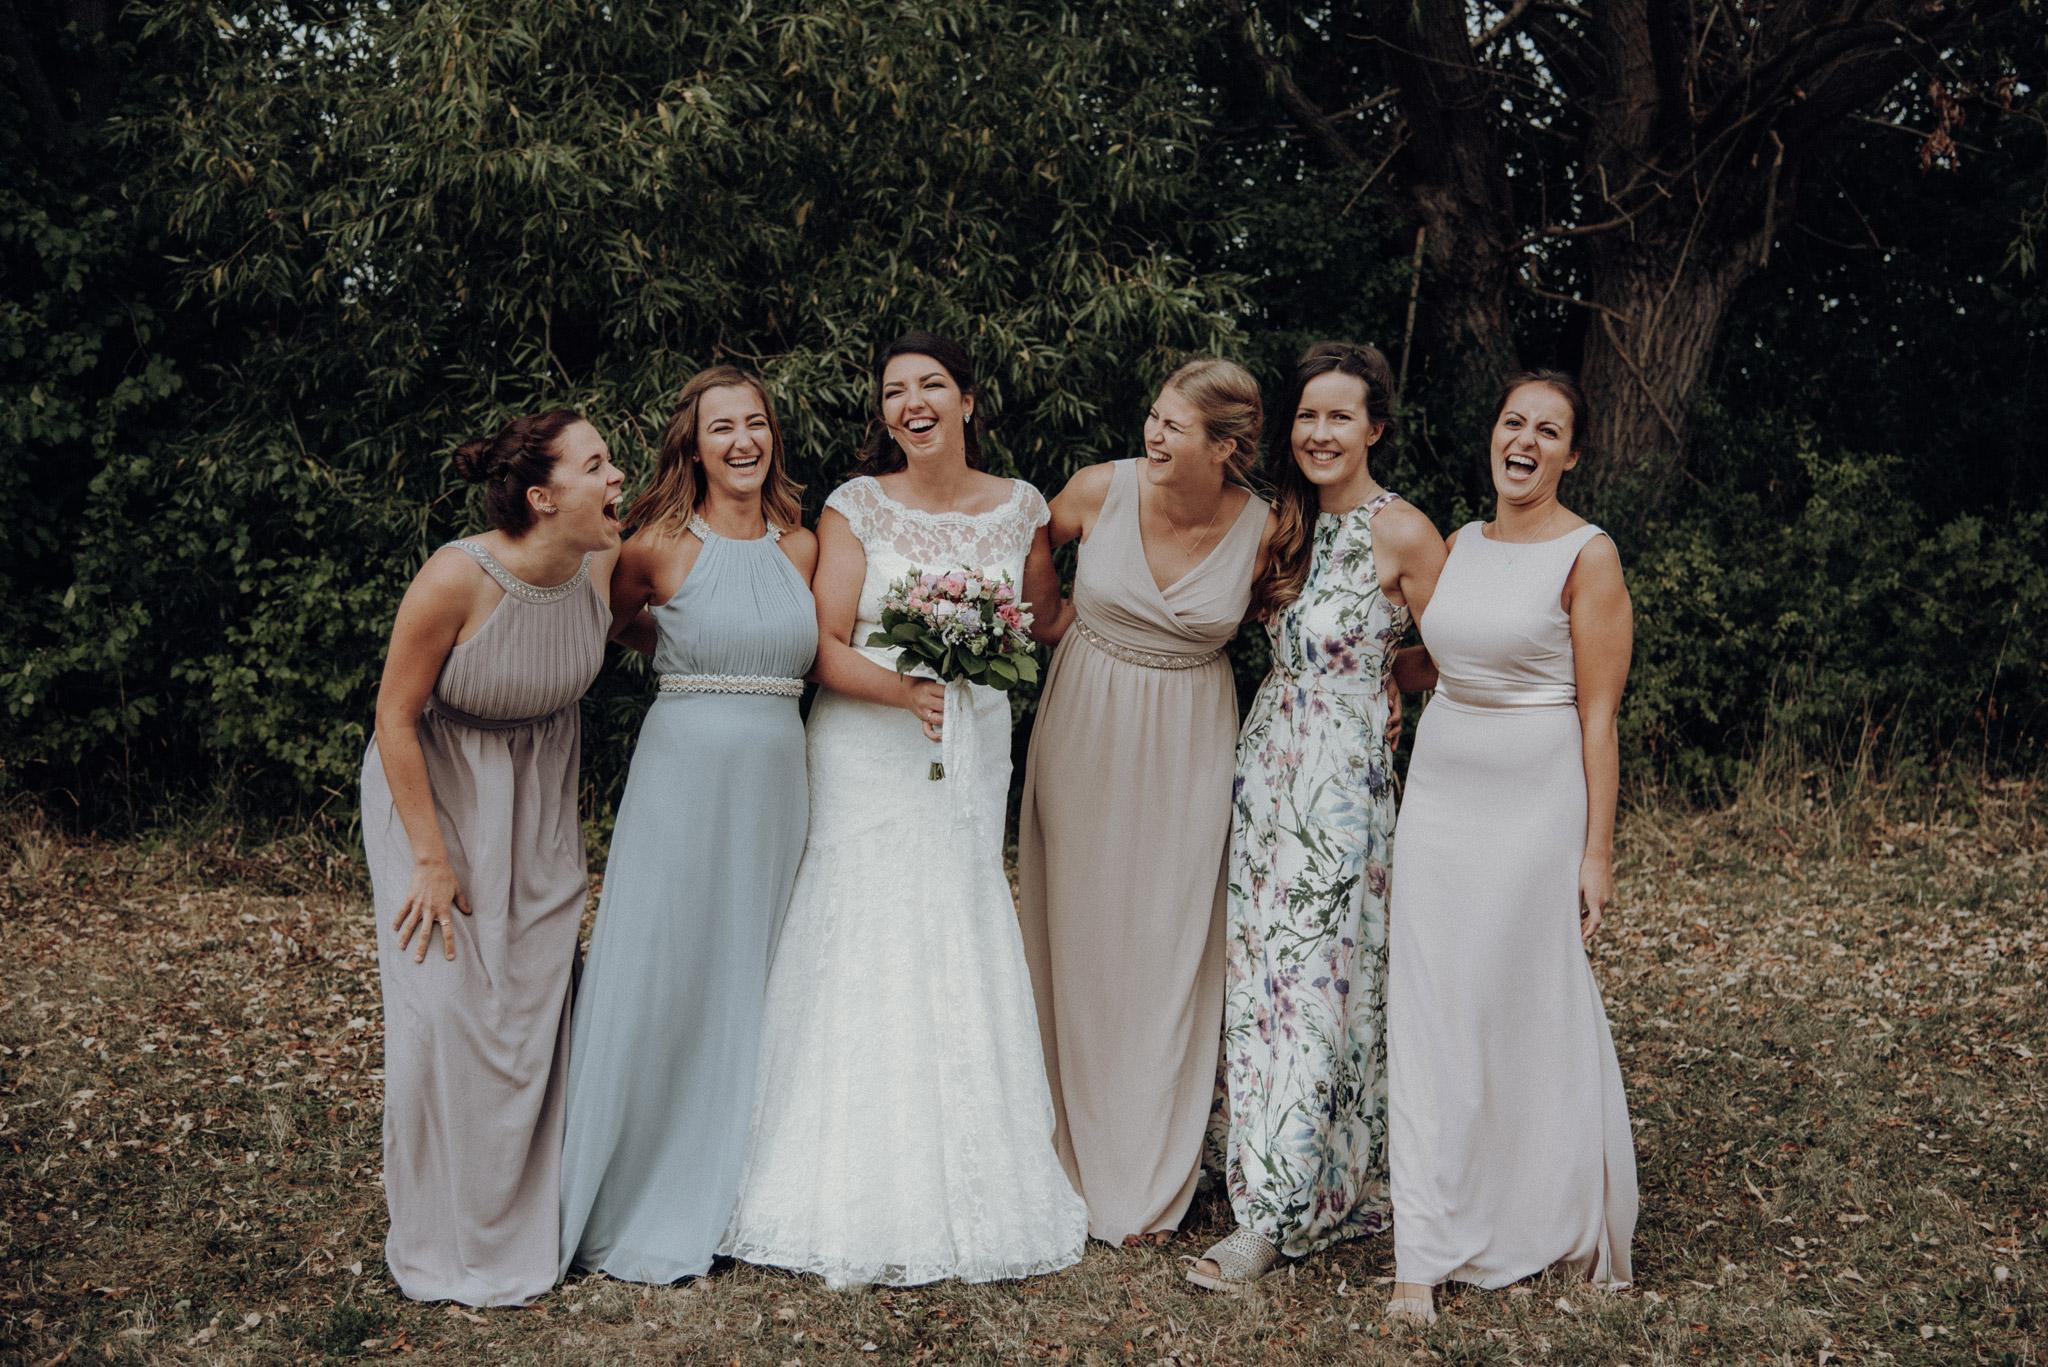 Gruppenbild Hochzeitsfotograf Gotha, Thüringen & Umgebung